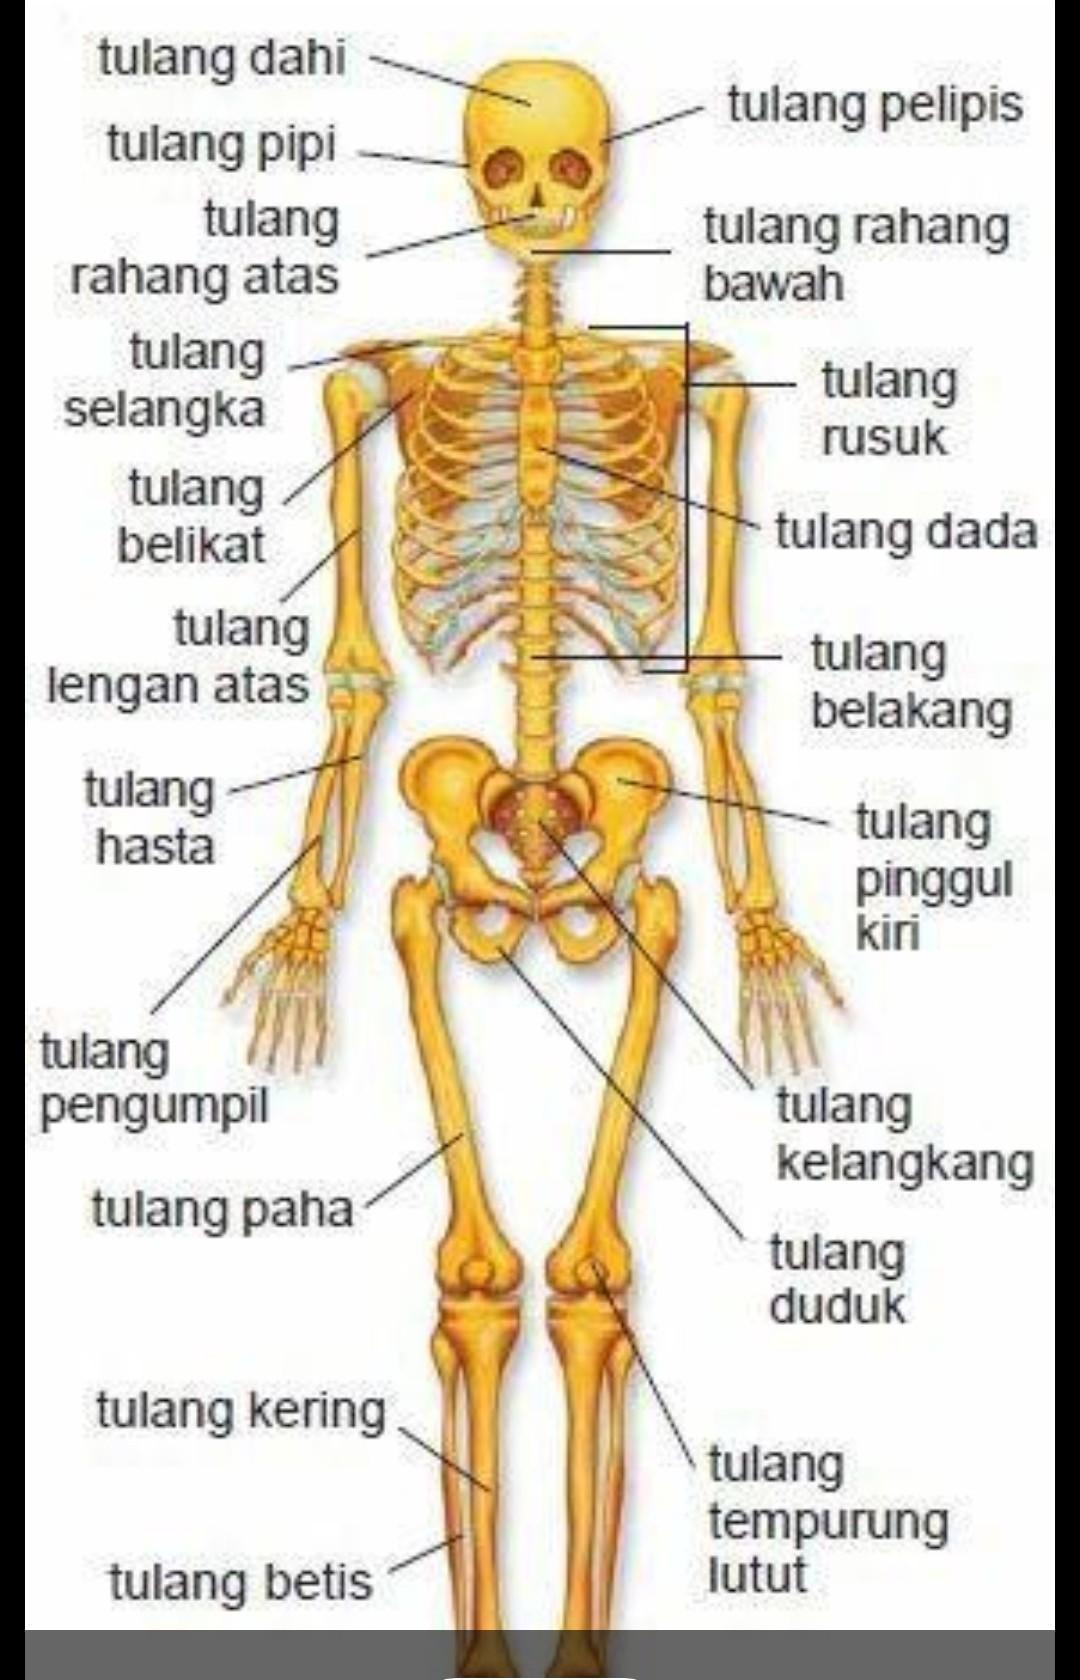 Fungsi Tulang Tempurung Lutut : fungsi, tulang, tempurung, lutut, Fungsi, Semua, Tulang, Tersebut?, Pleaseee., Tolong, Jawabbb...., Soalnya, Senin, Brainly.co.id